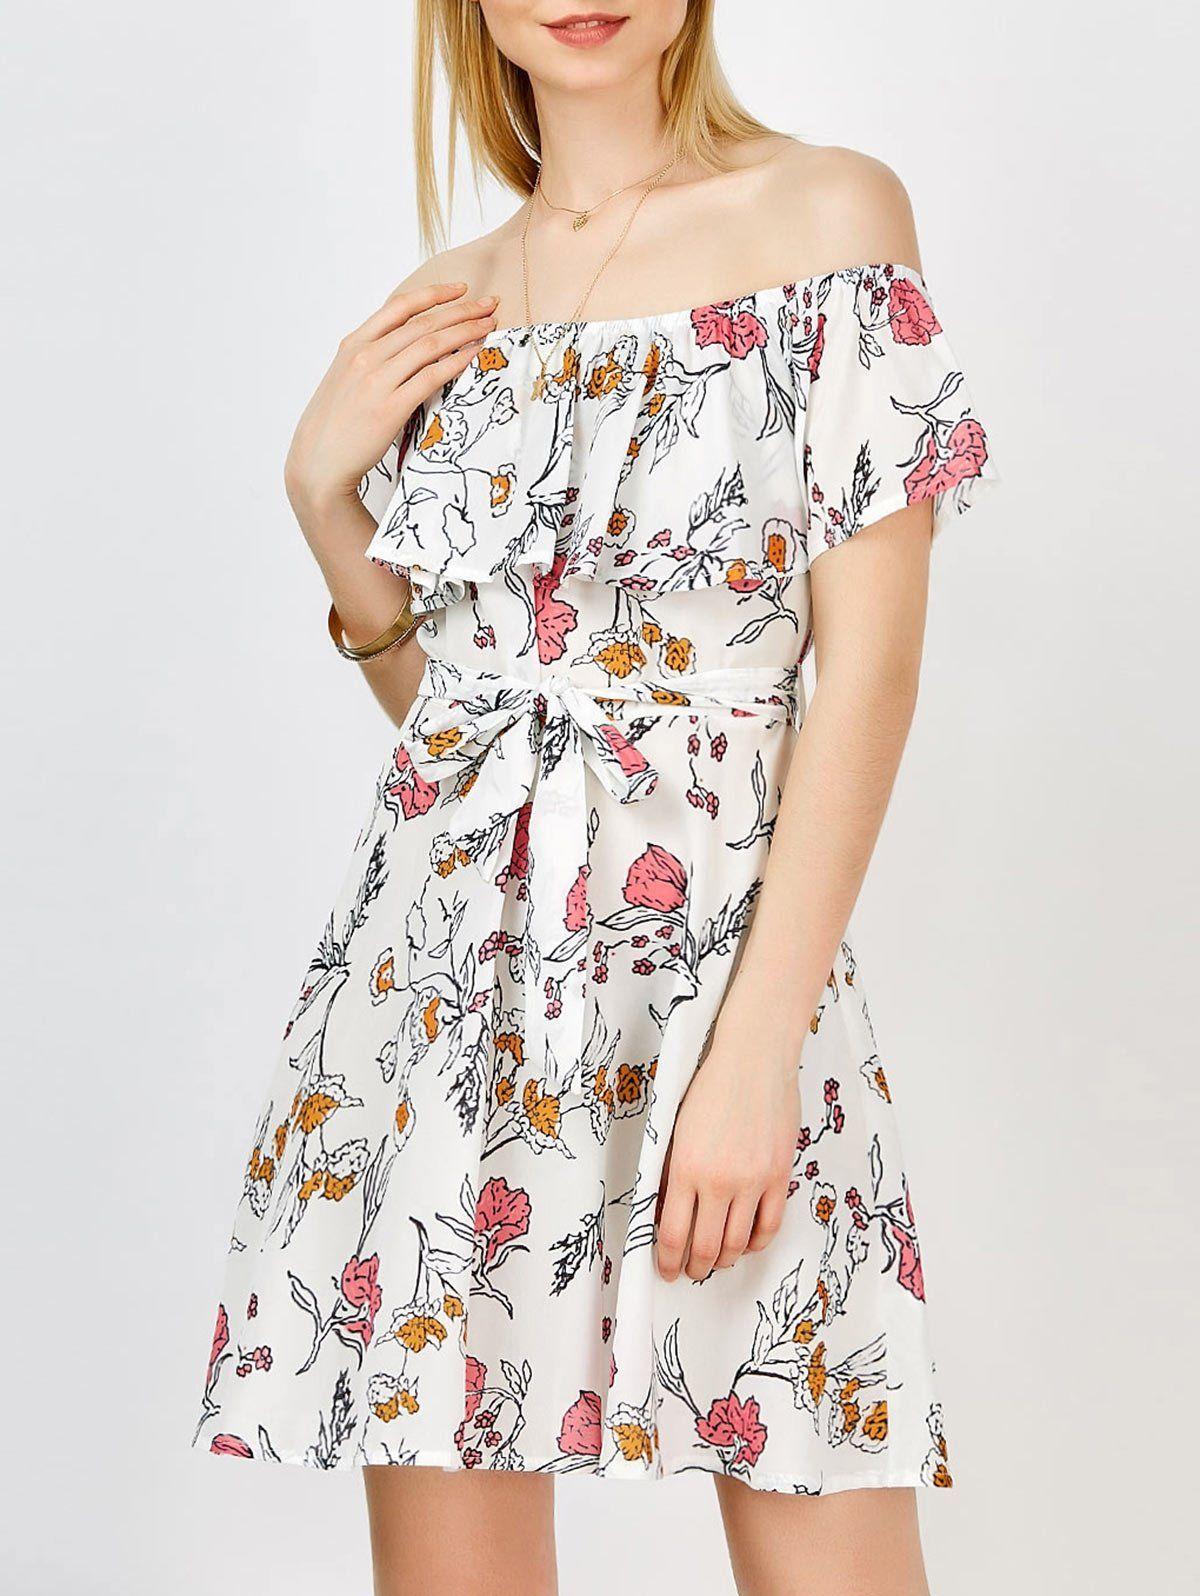 Casual Off The Shoulder Floral Summer Skater Dress Women Cheap Dresses Mini Dress Fashion Womens Printed Dresses [ 1596 x 1200 Pixel ]